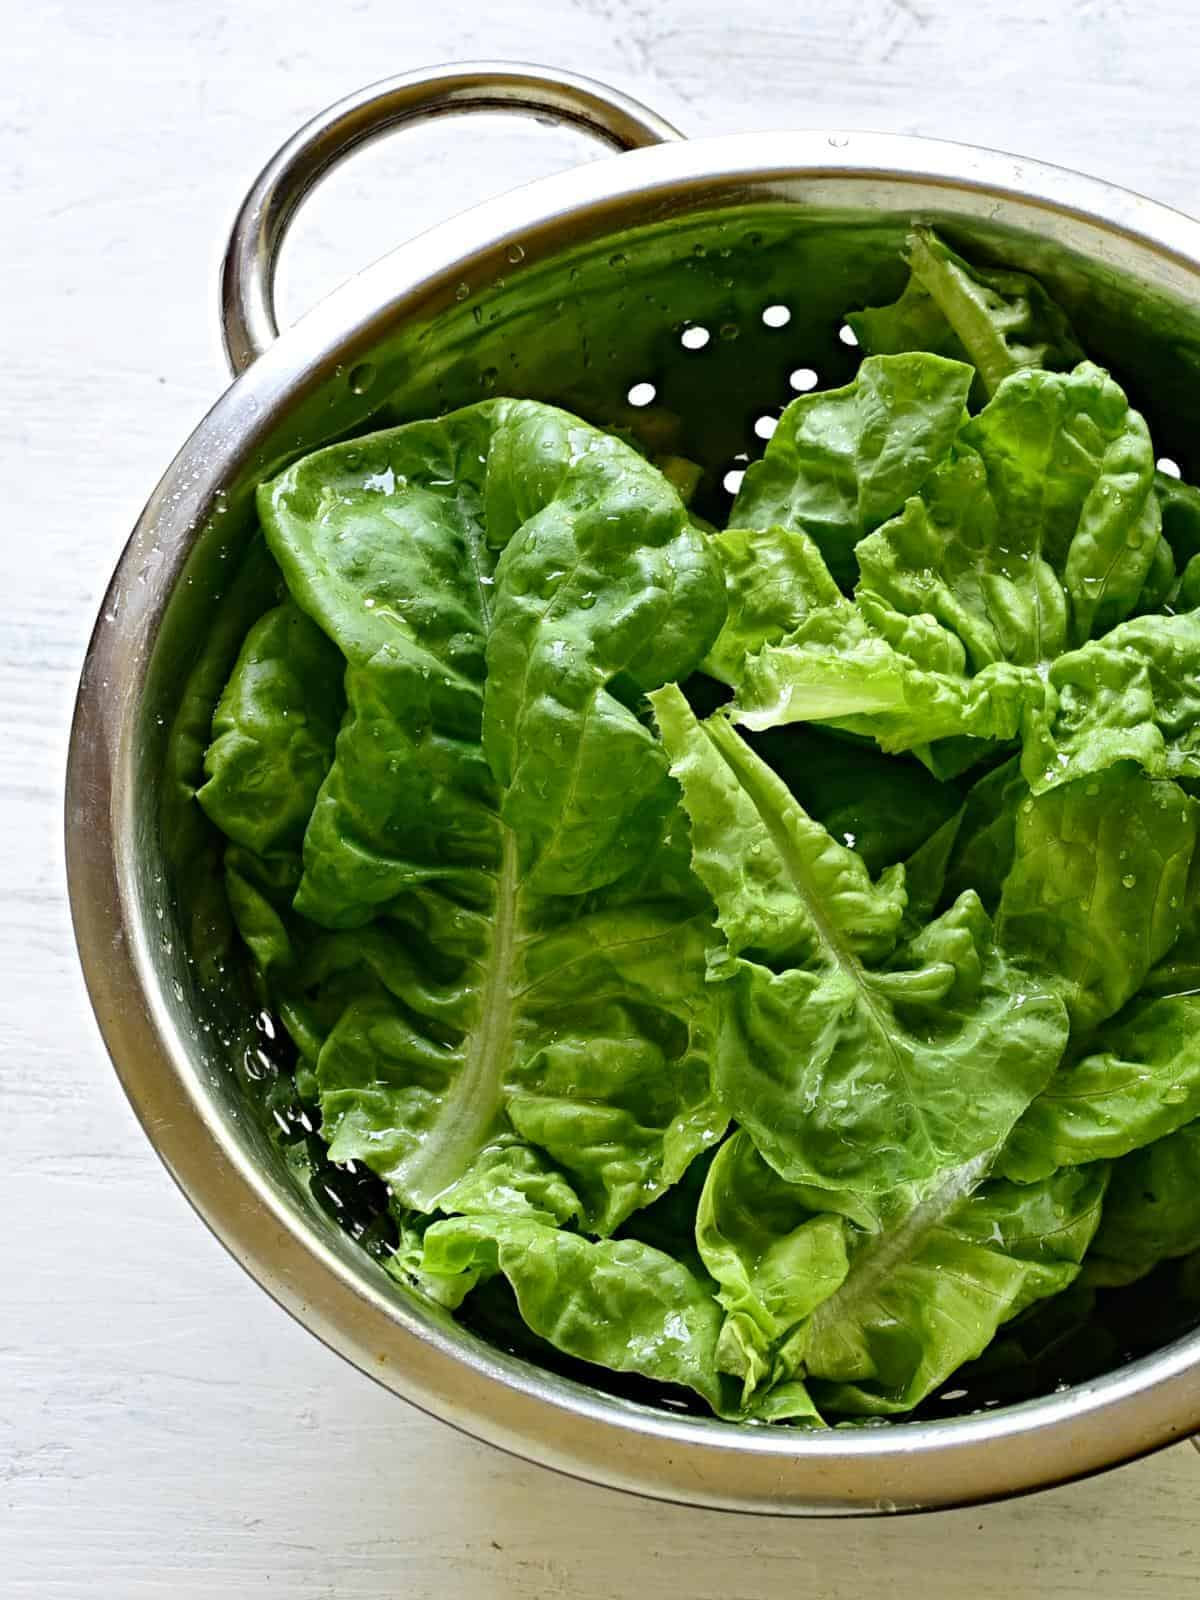 head lettuce leaves in a collander